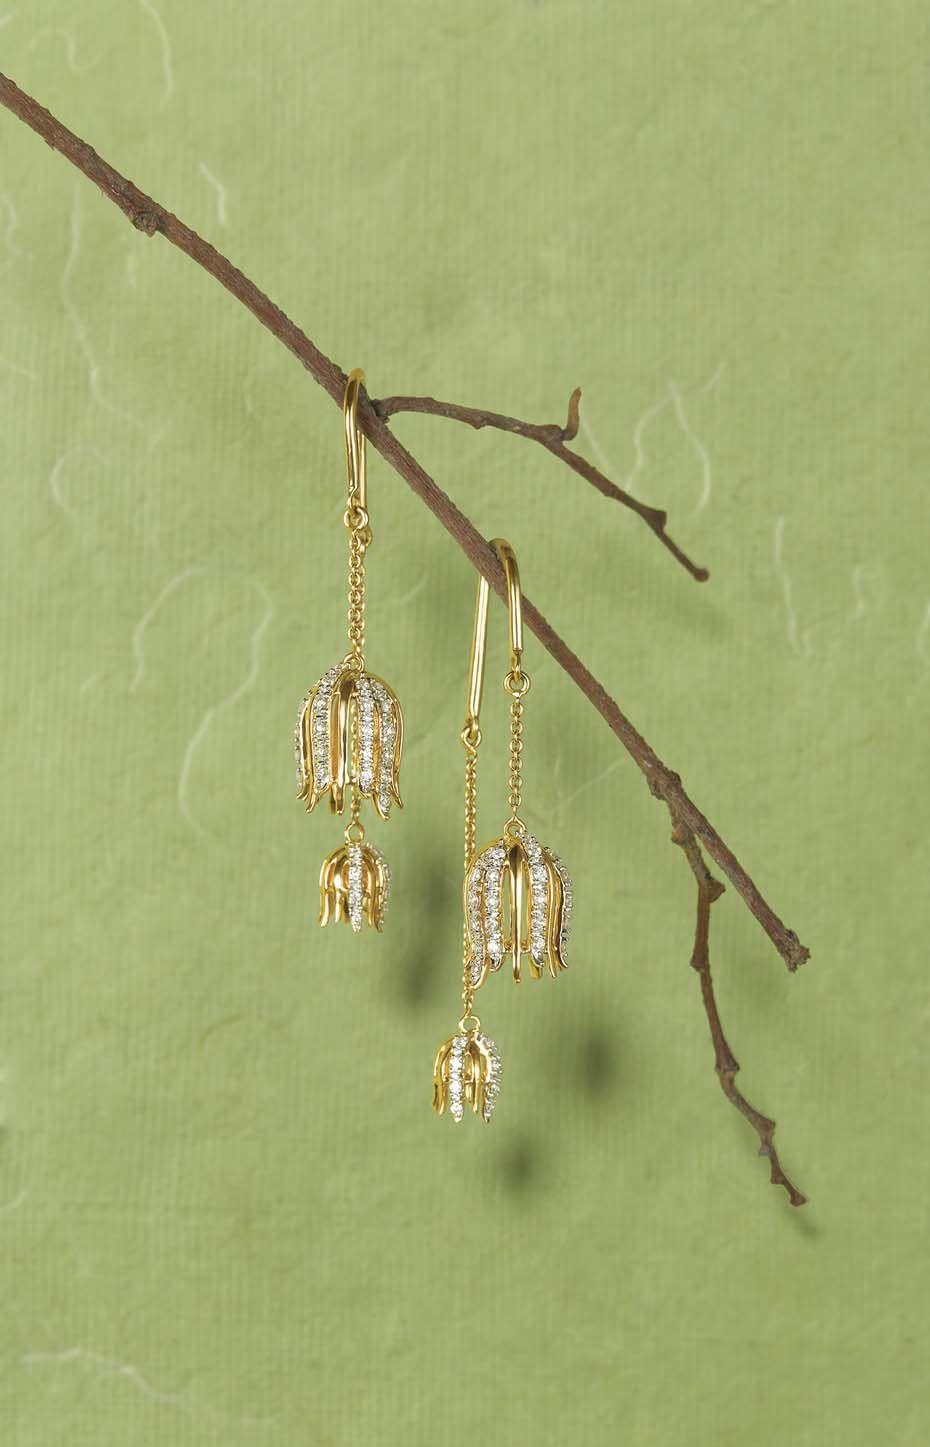 tanishq zyra jewellery collection - Sui Thaga earrings Google ...